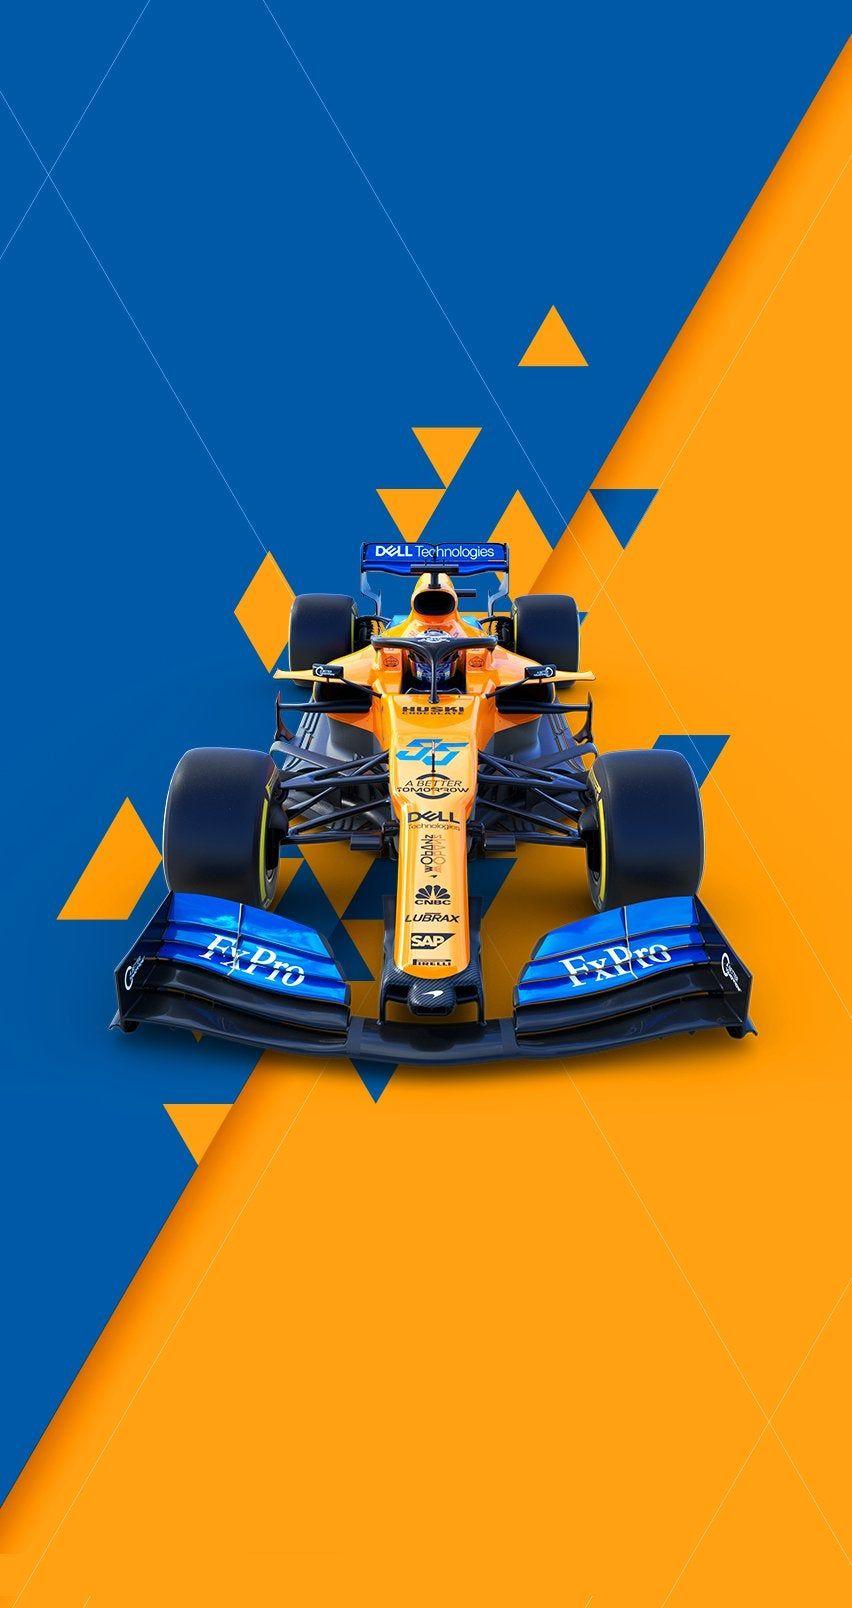 McLaren Formula 1 Wallpapers   Top McLaren Formula 1 852x1608